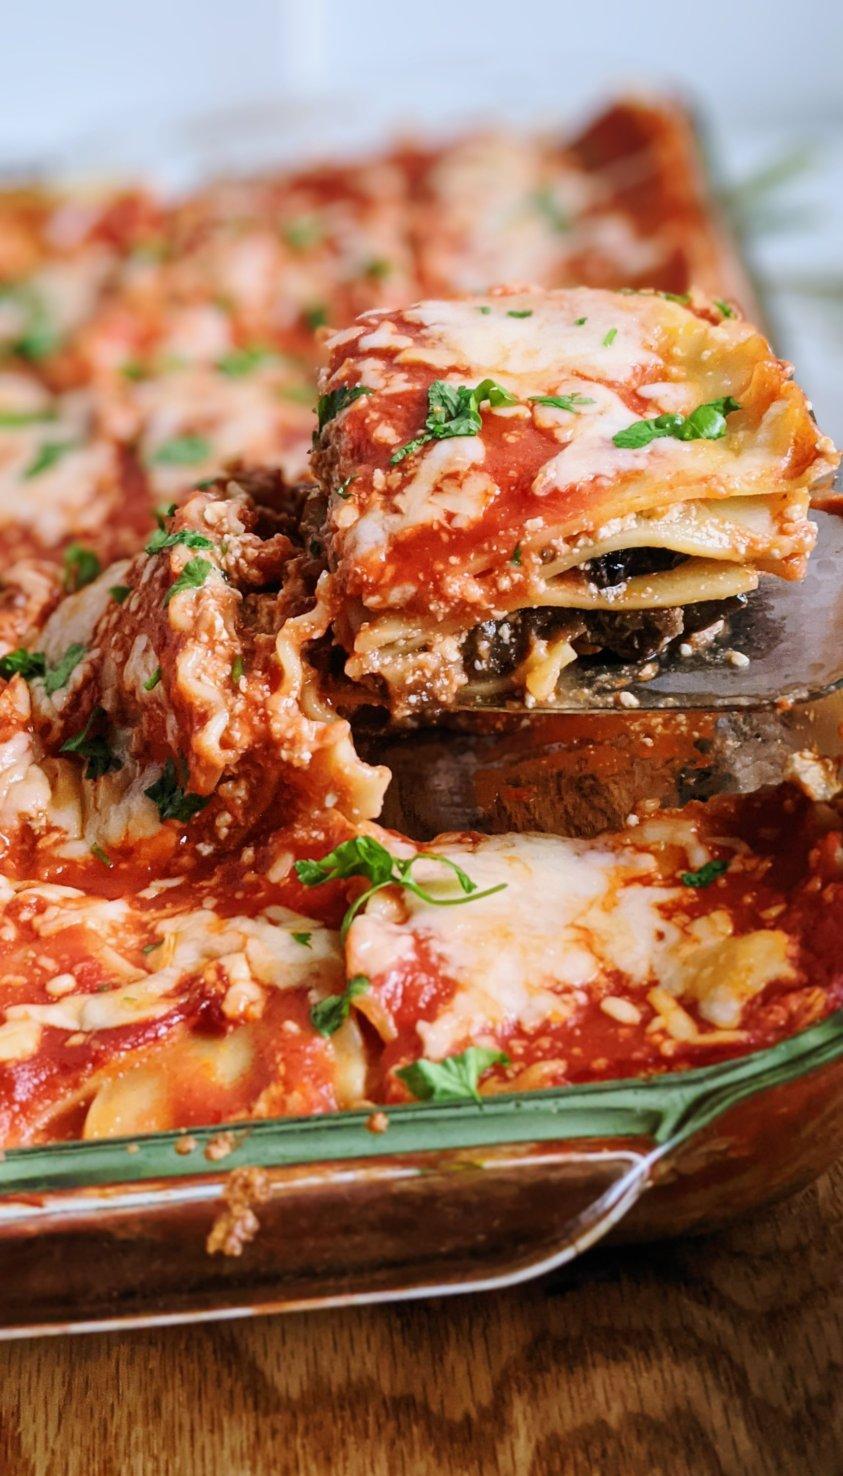 lasagna with tofu ricotta recipe homemade east high protein italian recipes vegan gluten free vegetarian meatless veganuary recipes low calorie